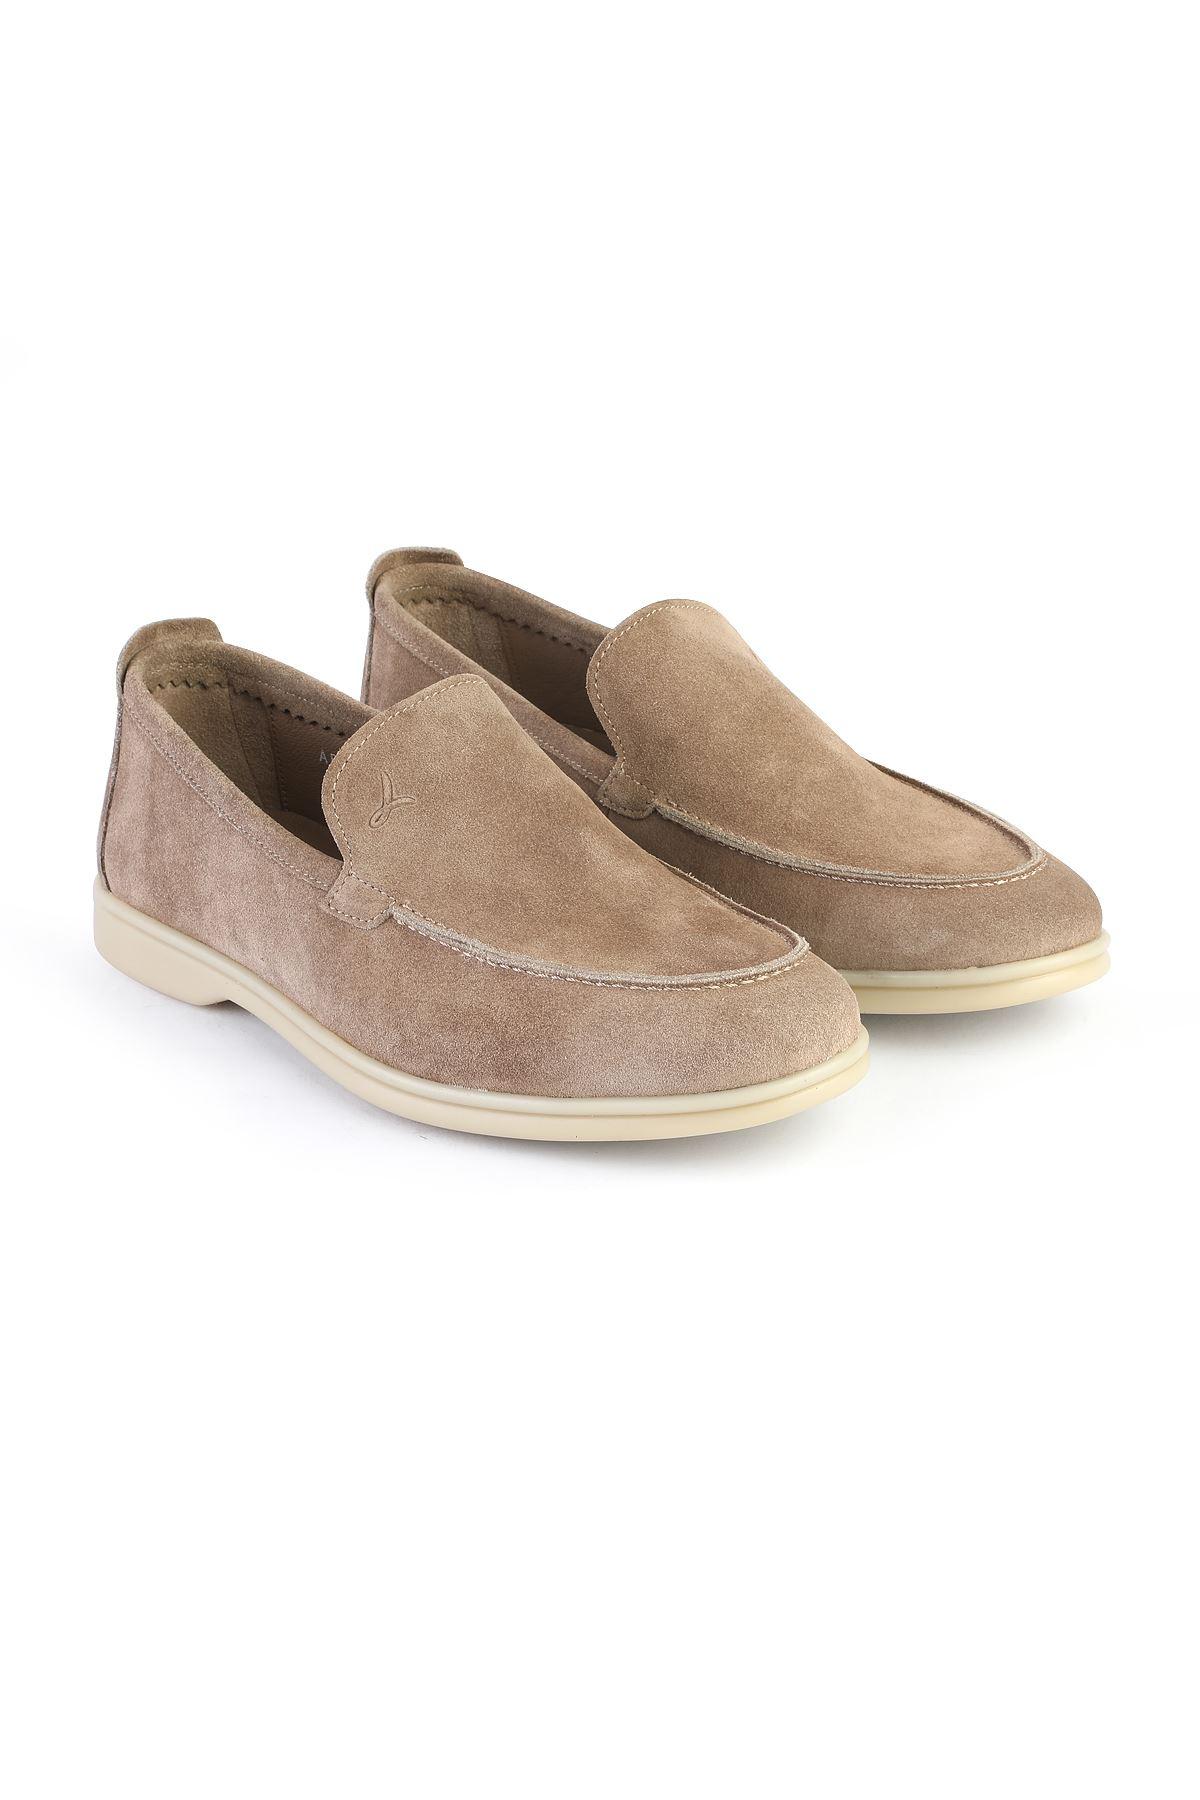 Libero 3004 Mink Loafer Shoes